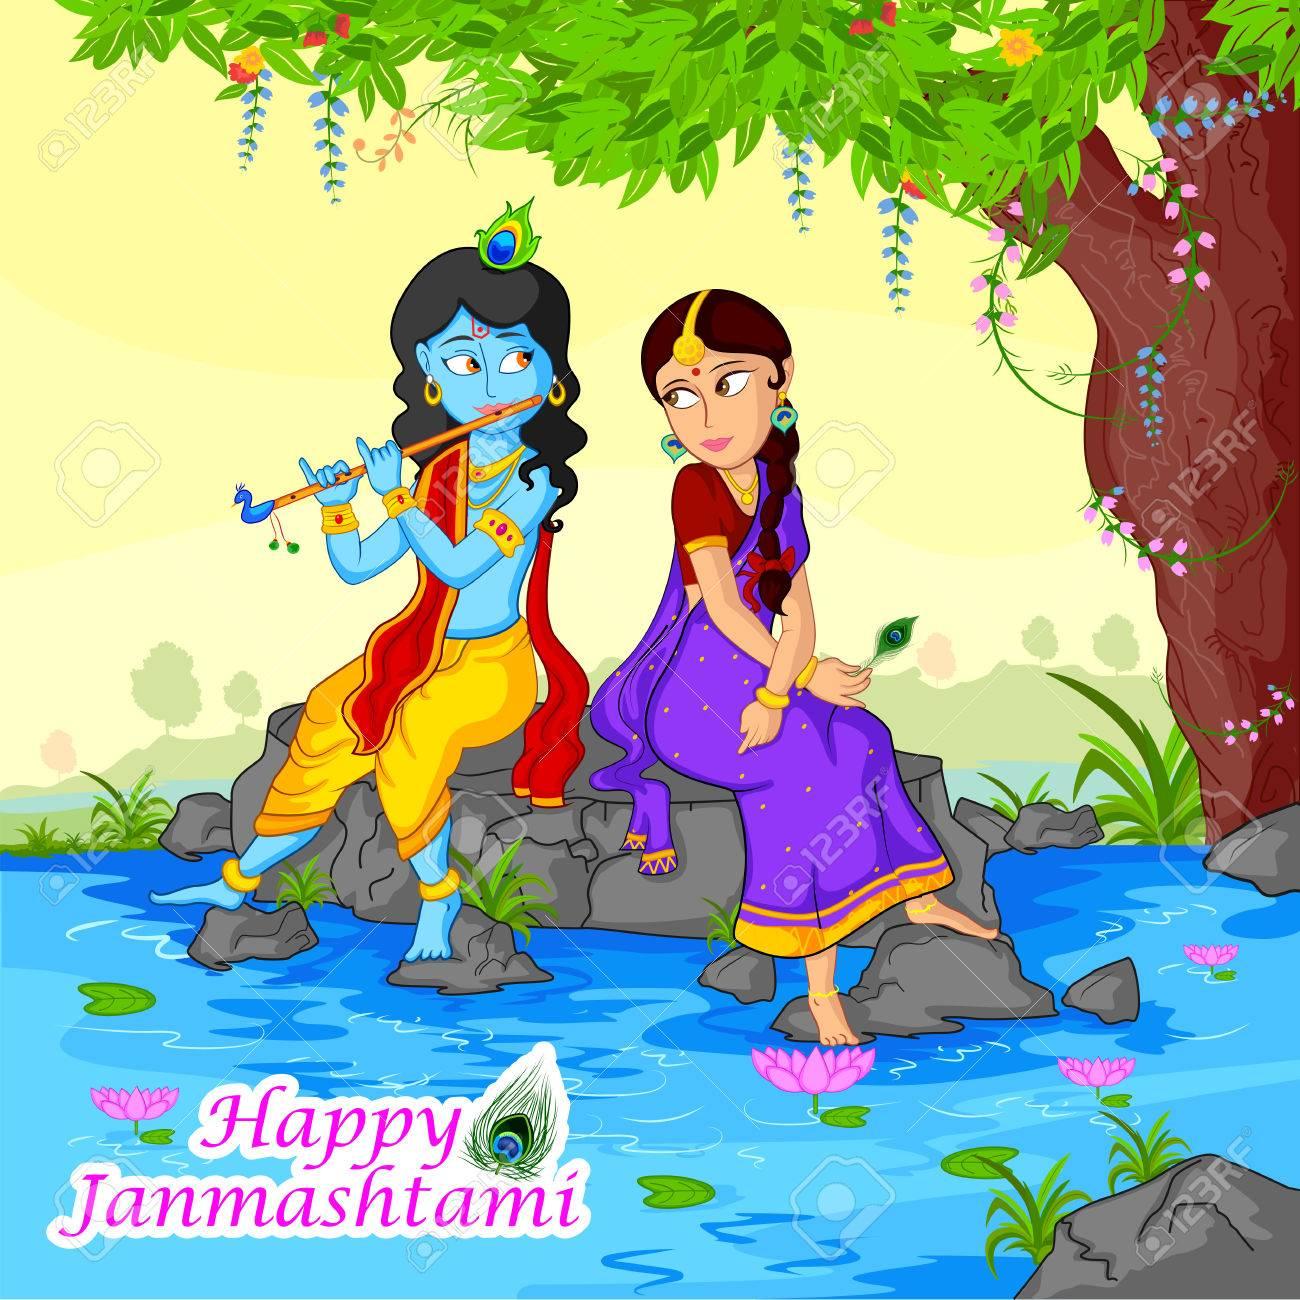 Krishna playing flute with Radha on Janmashtami background in